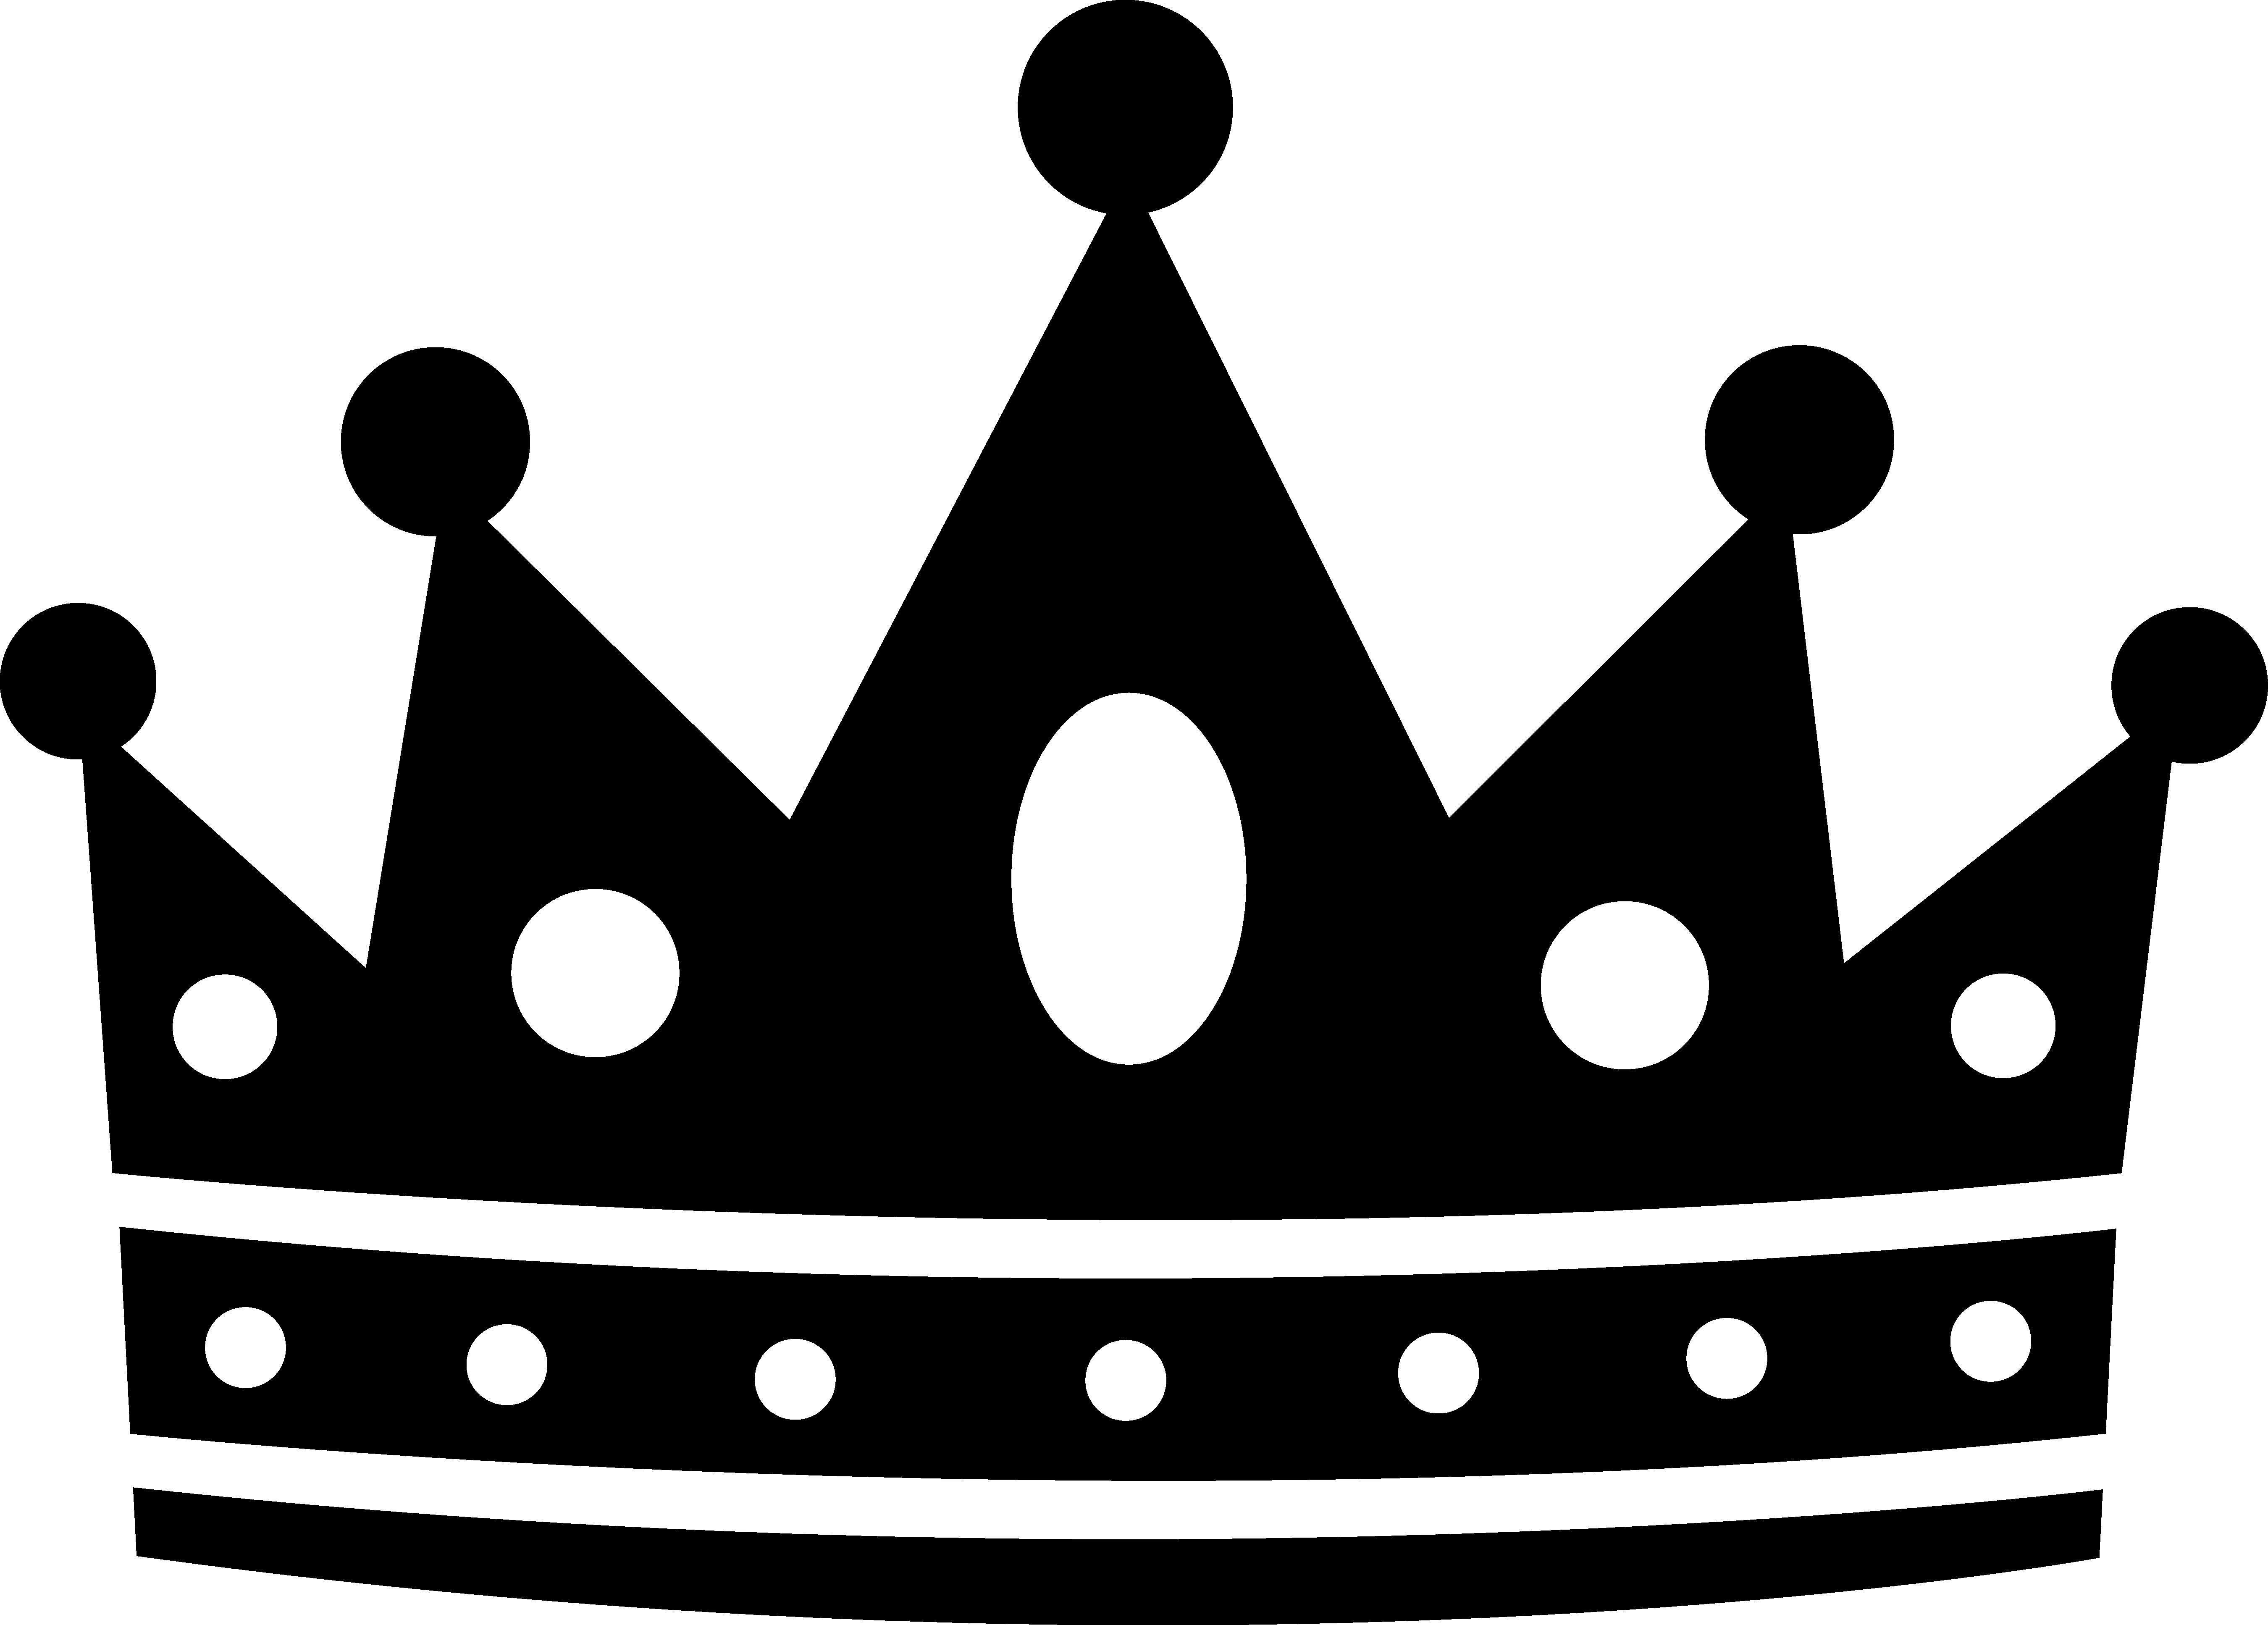 Black king crown png - photo#3